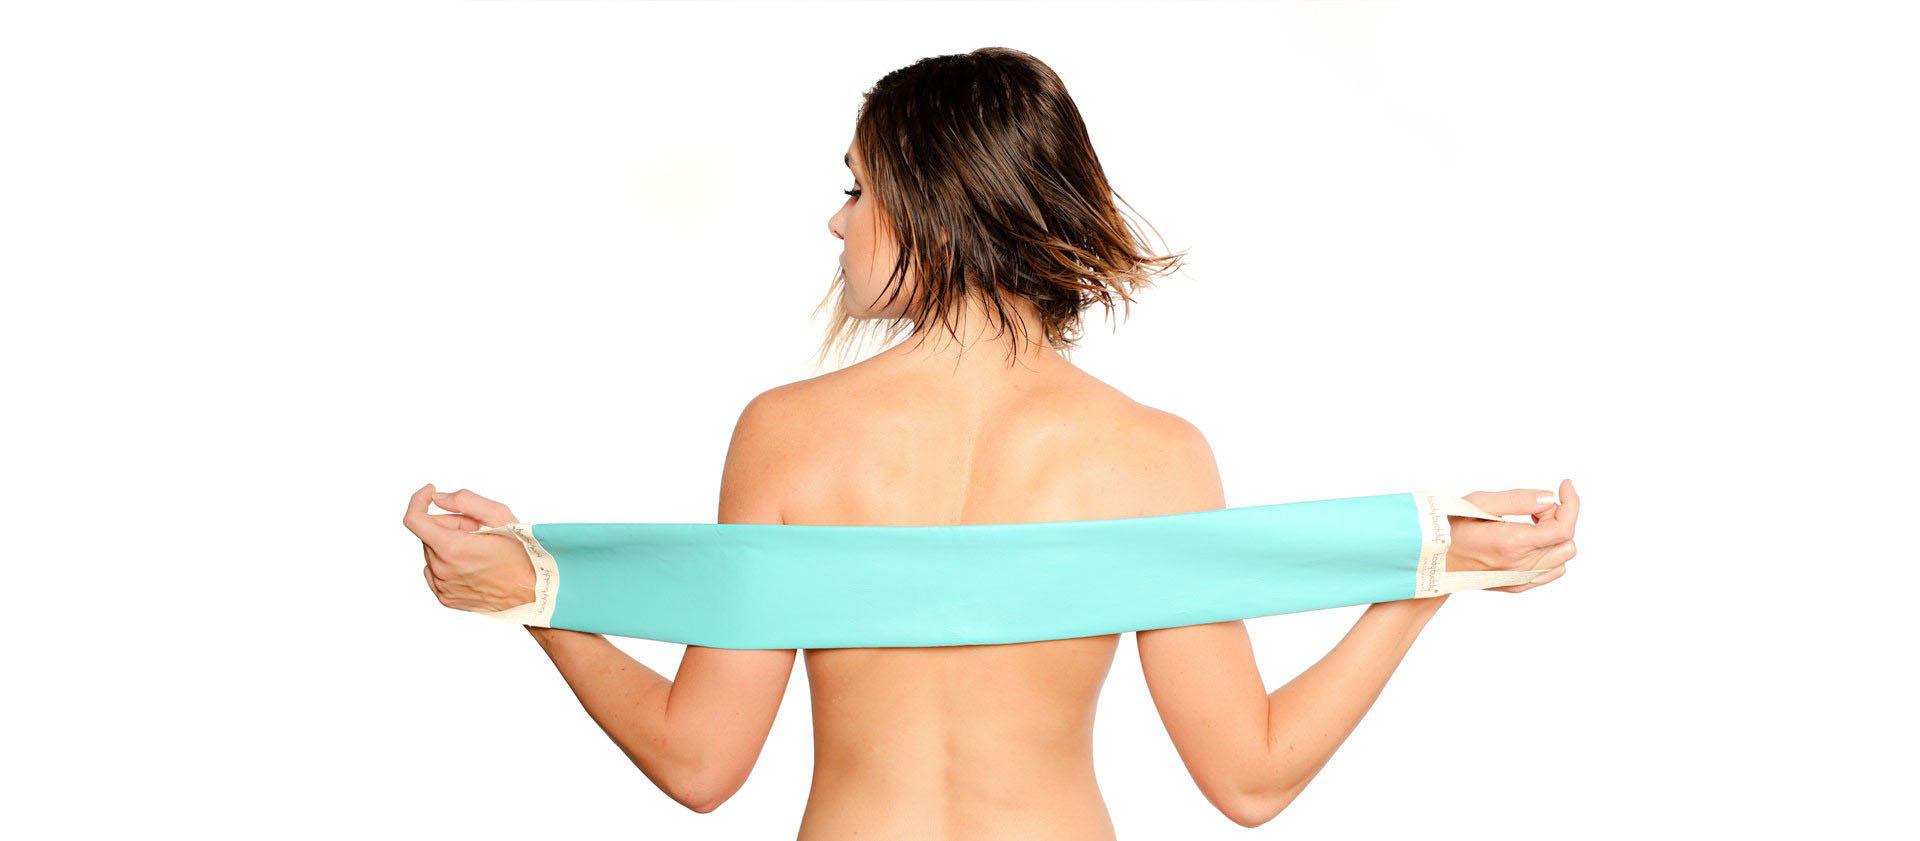 Aqua Back & Body Lotion Applicator